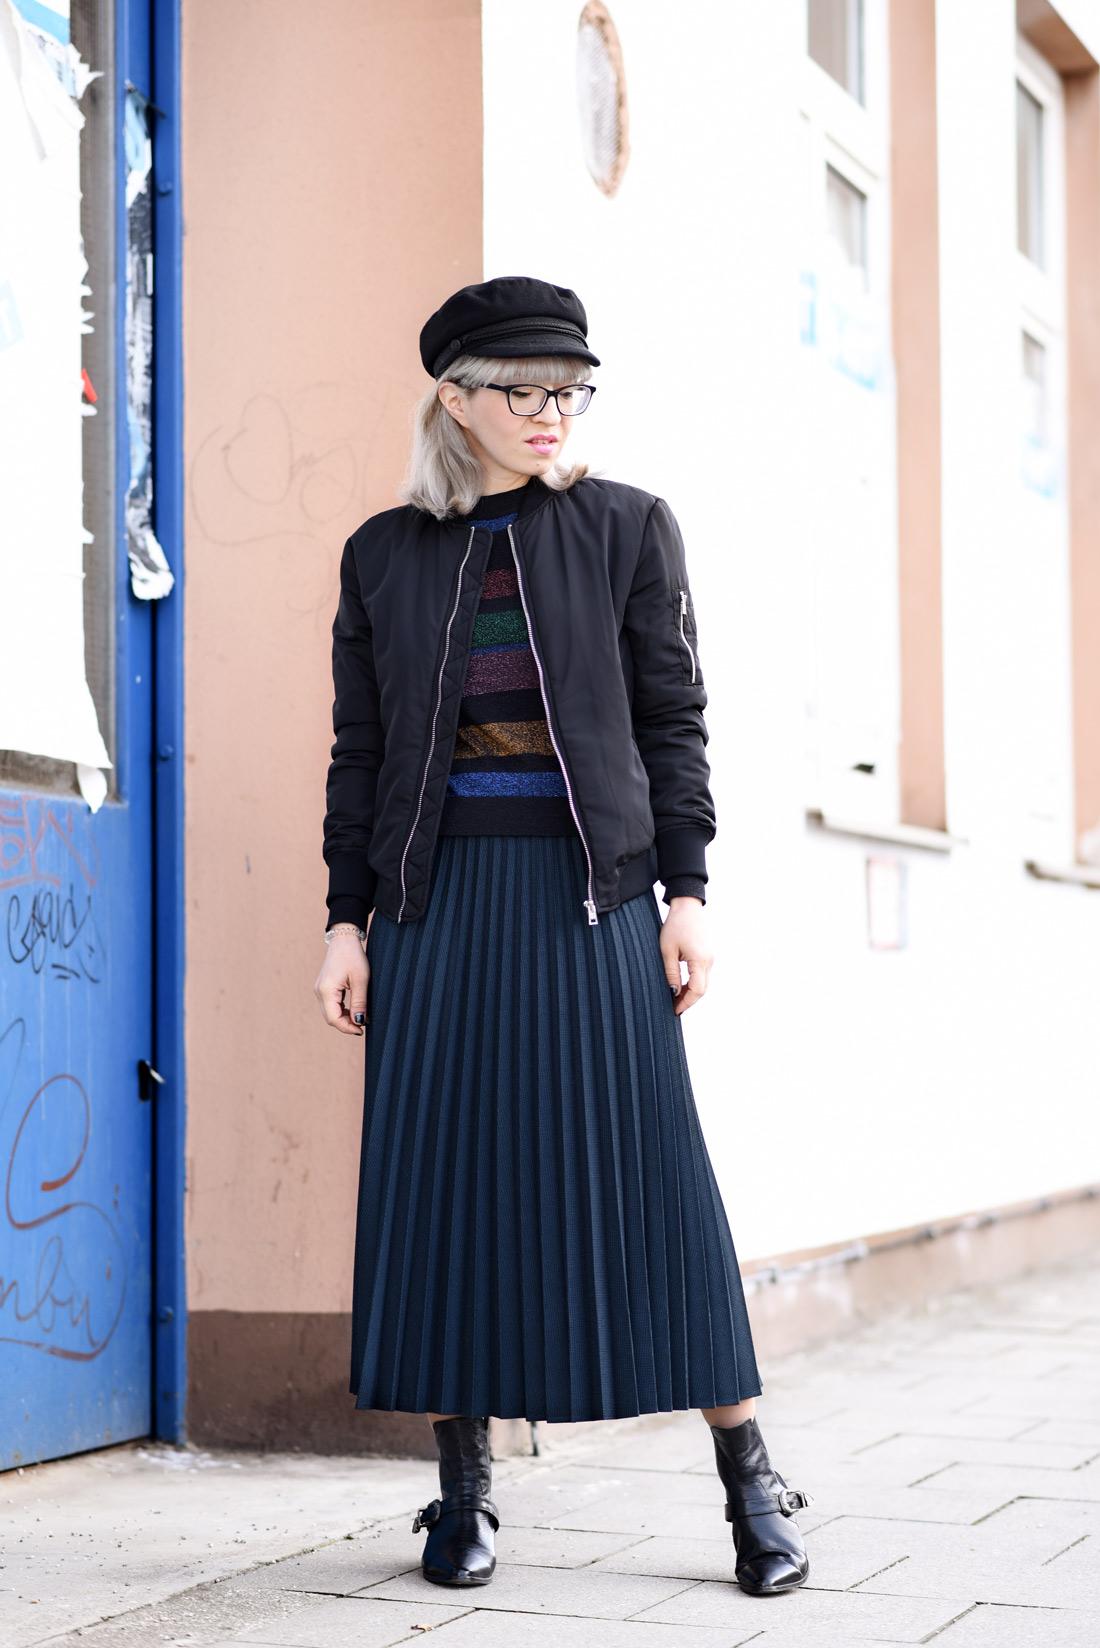 gucci-lookalike-blogger-nachgesternistvormorgen-plissee-rock-skirt-outfit-streetstyle-inspiration-muenchen-modeblog-1